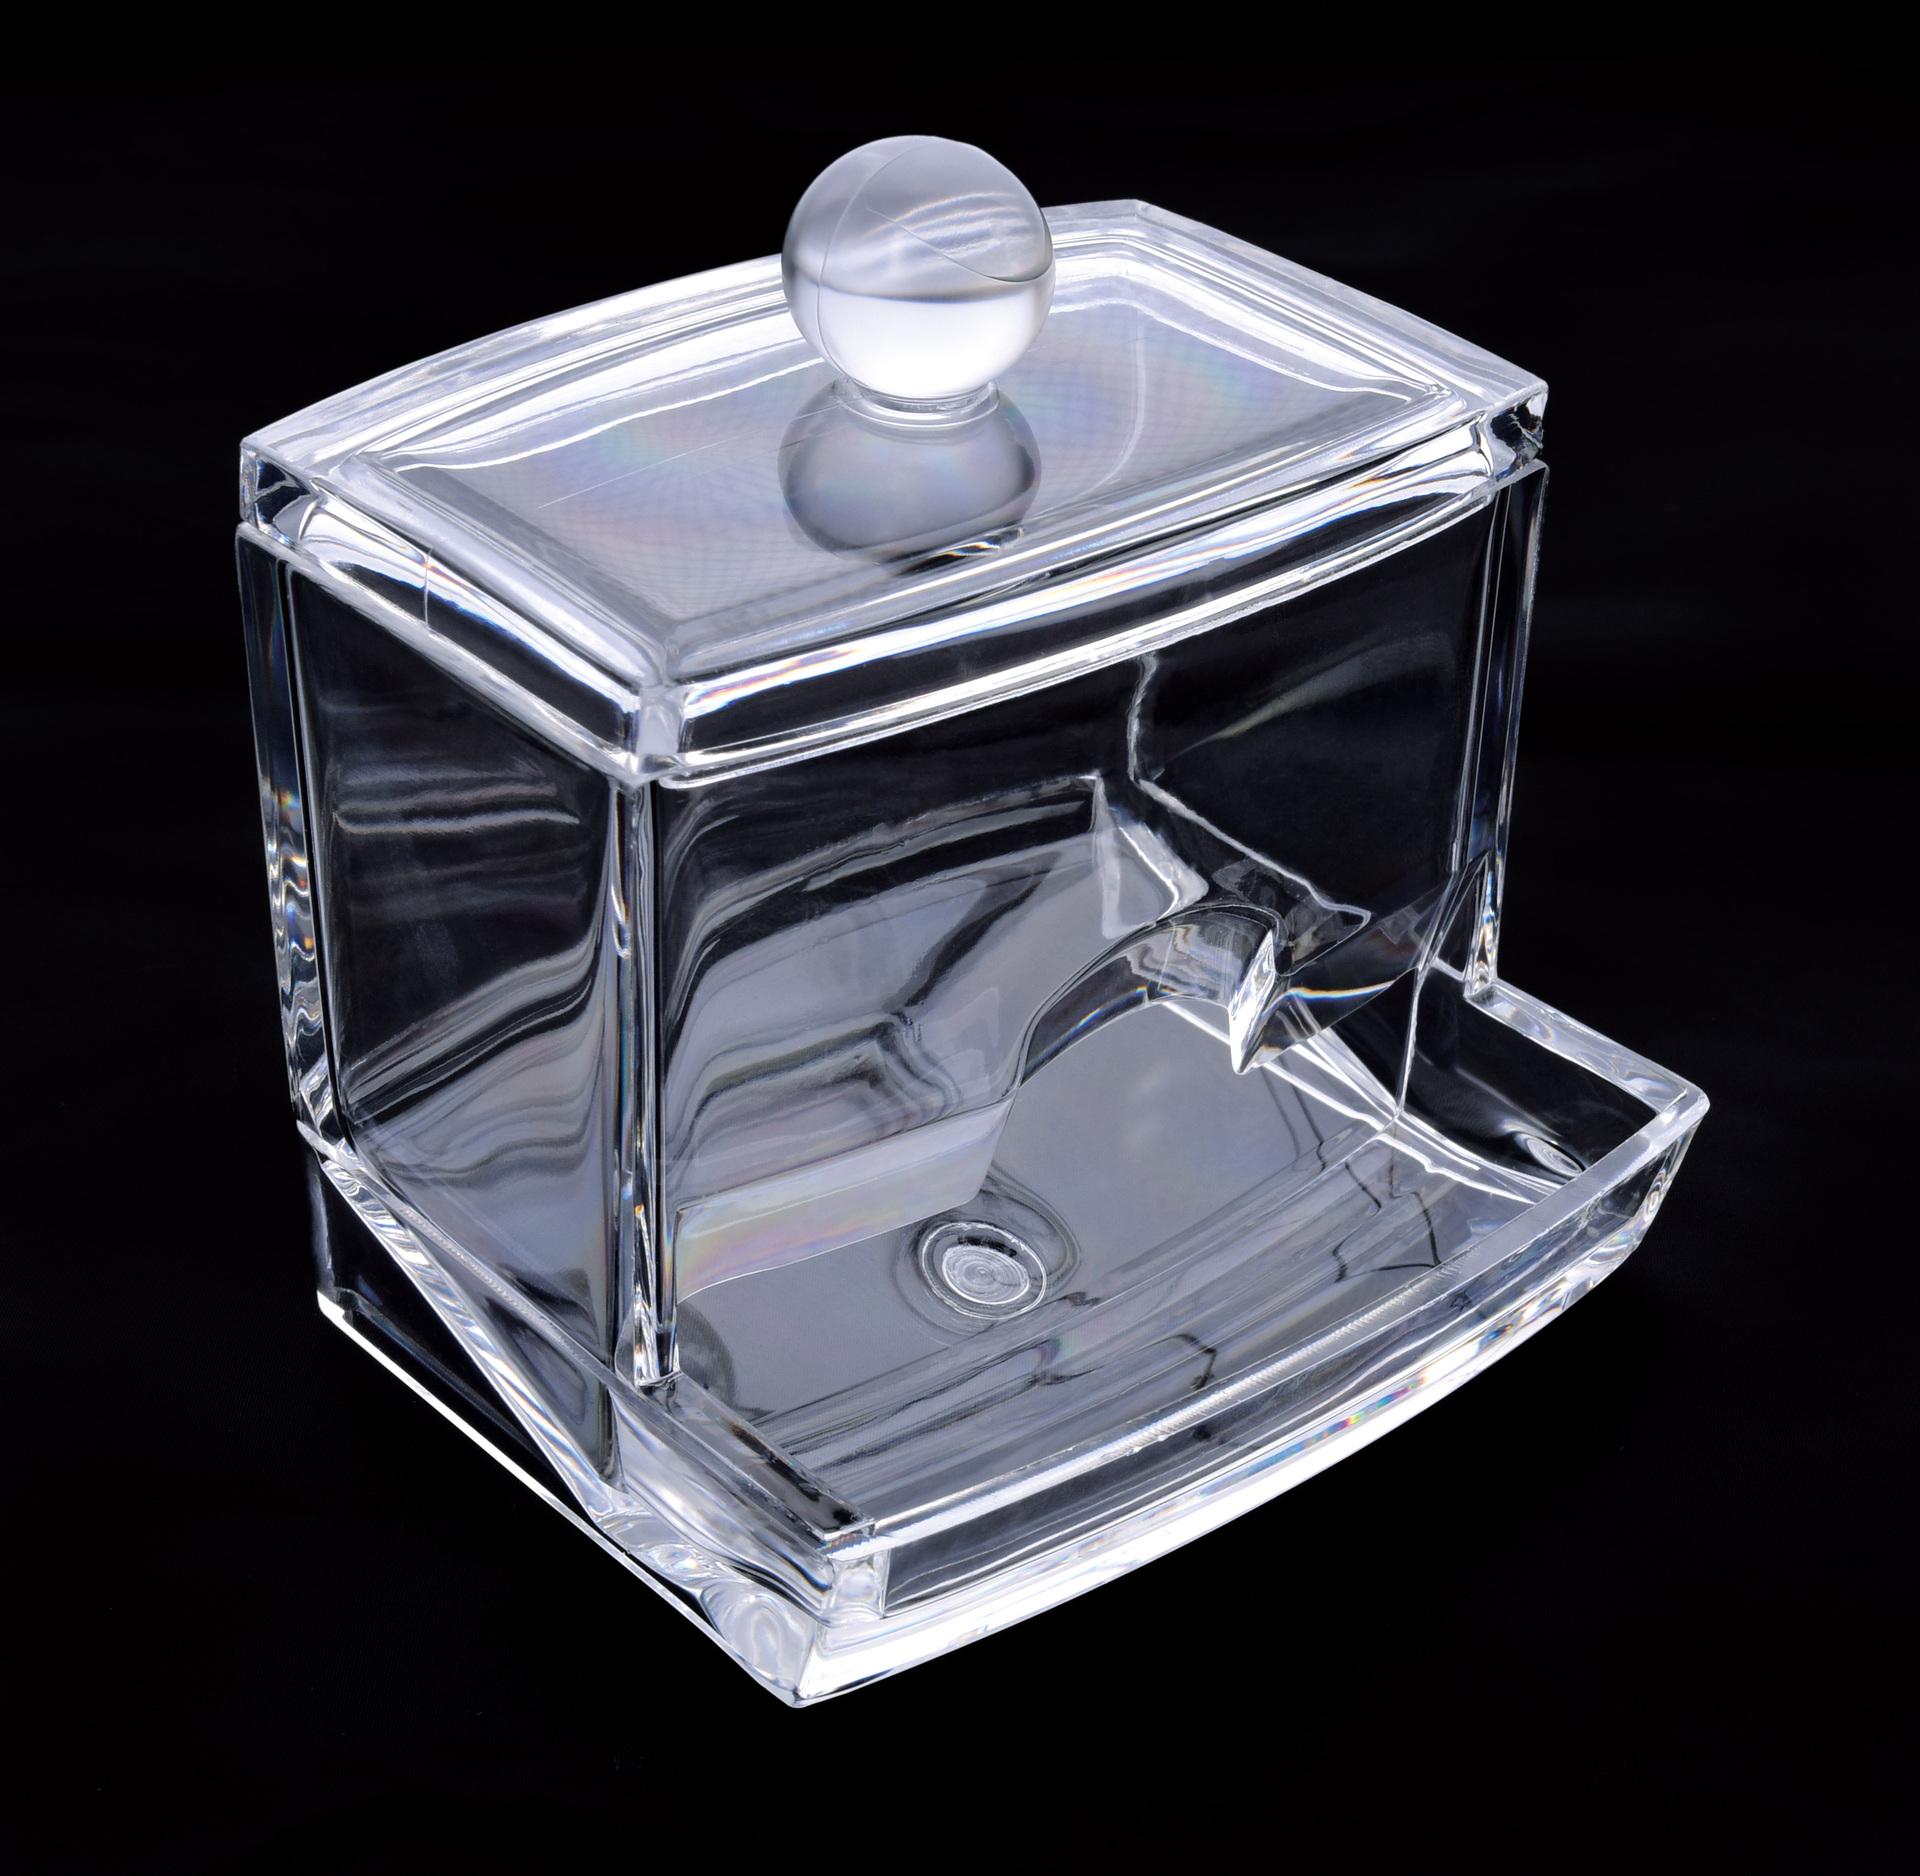 Dóza na vatové tyčinky/uchošťoury, z pevného plastu